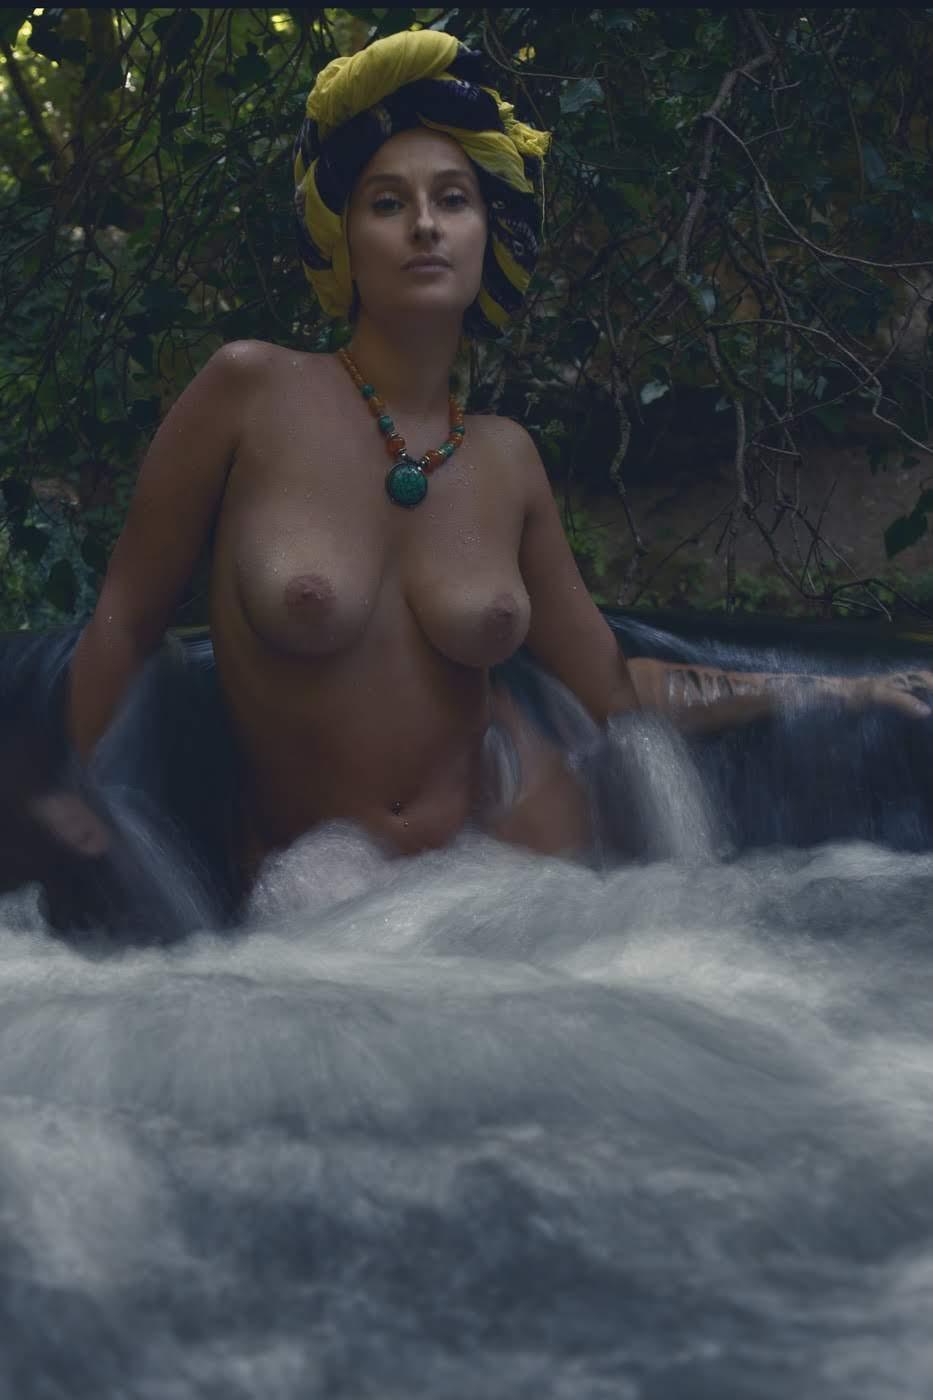 Categorie: Boudoir & Artistic Nude, Glamour, Portrait - Photographer: LUCA CORSETTI - Model: CLAUDIA TOLLIS - Assistant: SONIA DE ANGELIS - Location: Cascate di Monte Gelato, Mazzano Romano, RM, Italia